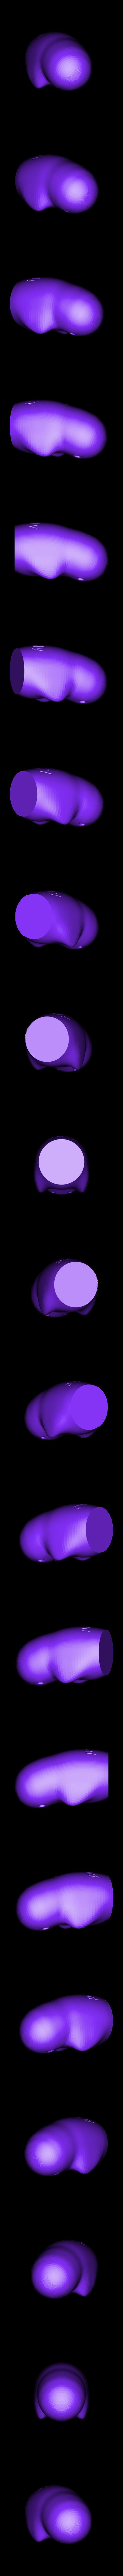 ghost.stl Download free STL file Ghost finger puppet • 3D printer design, Poly